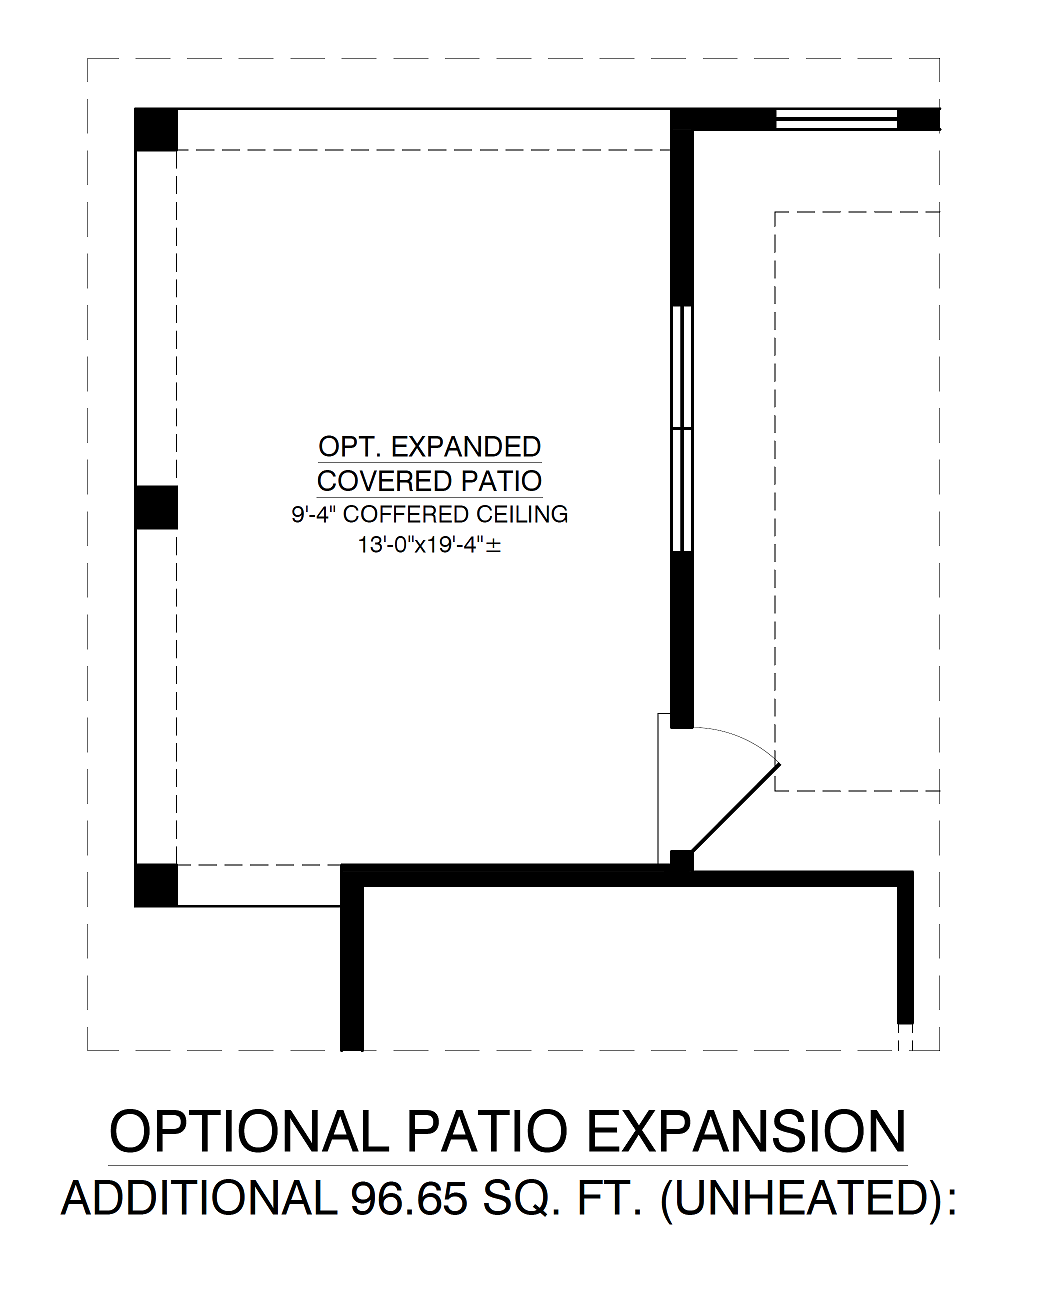 Optional Patio Expansion